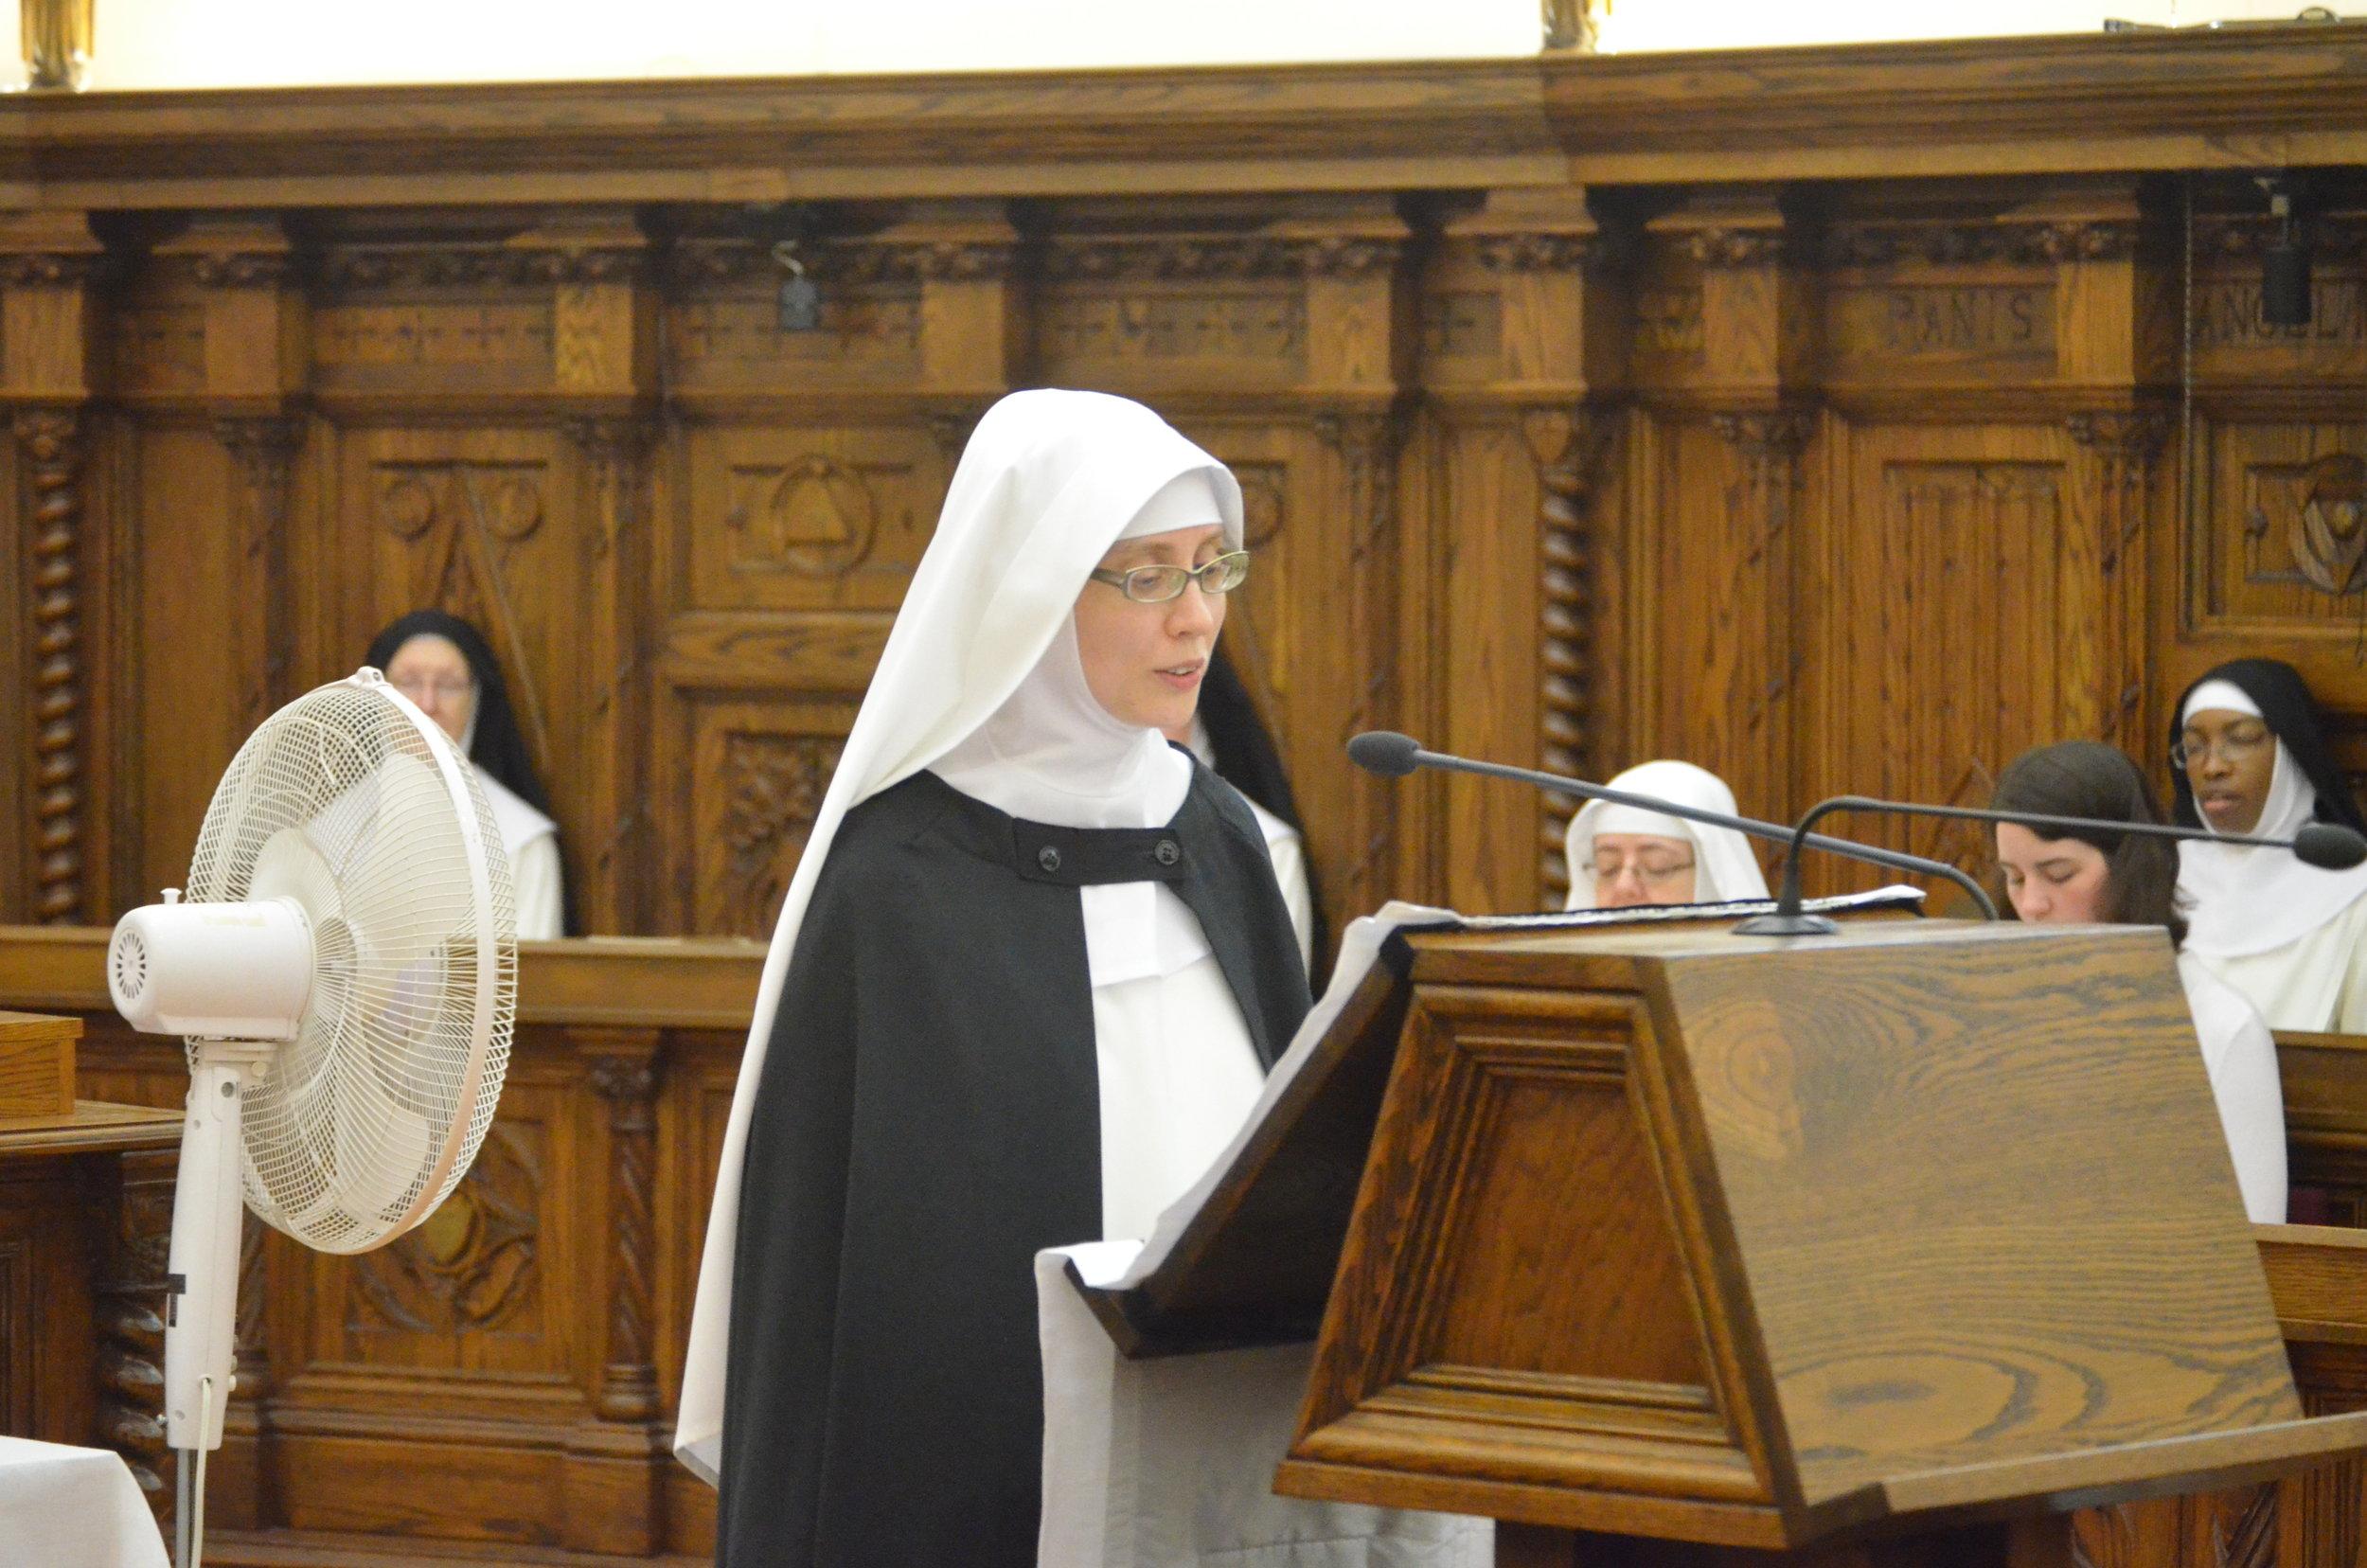 Sr. Maria Johanna reads the first reading